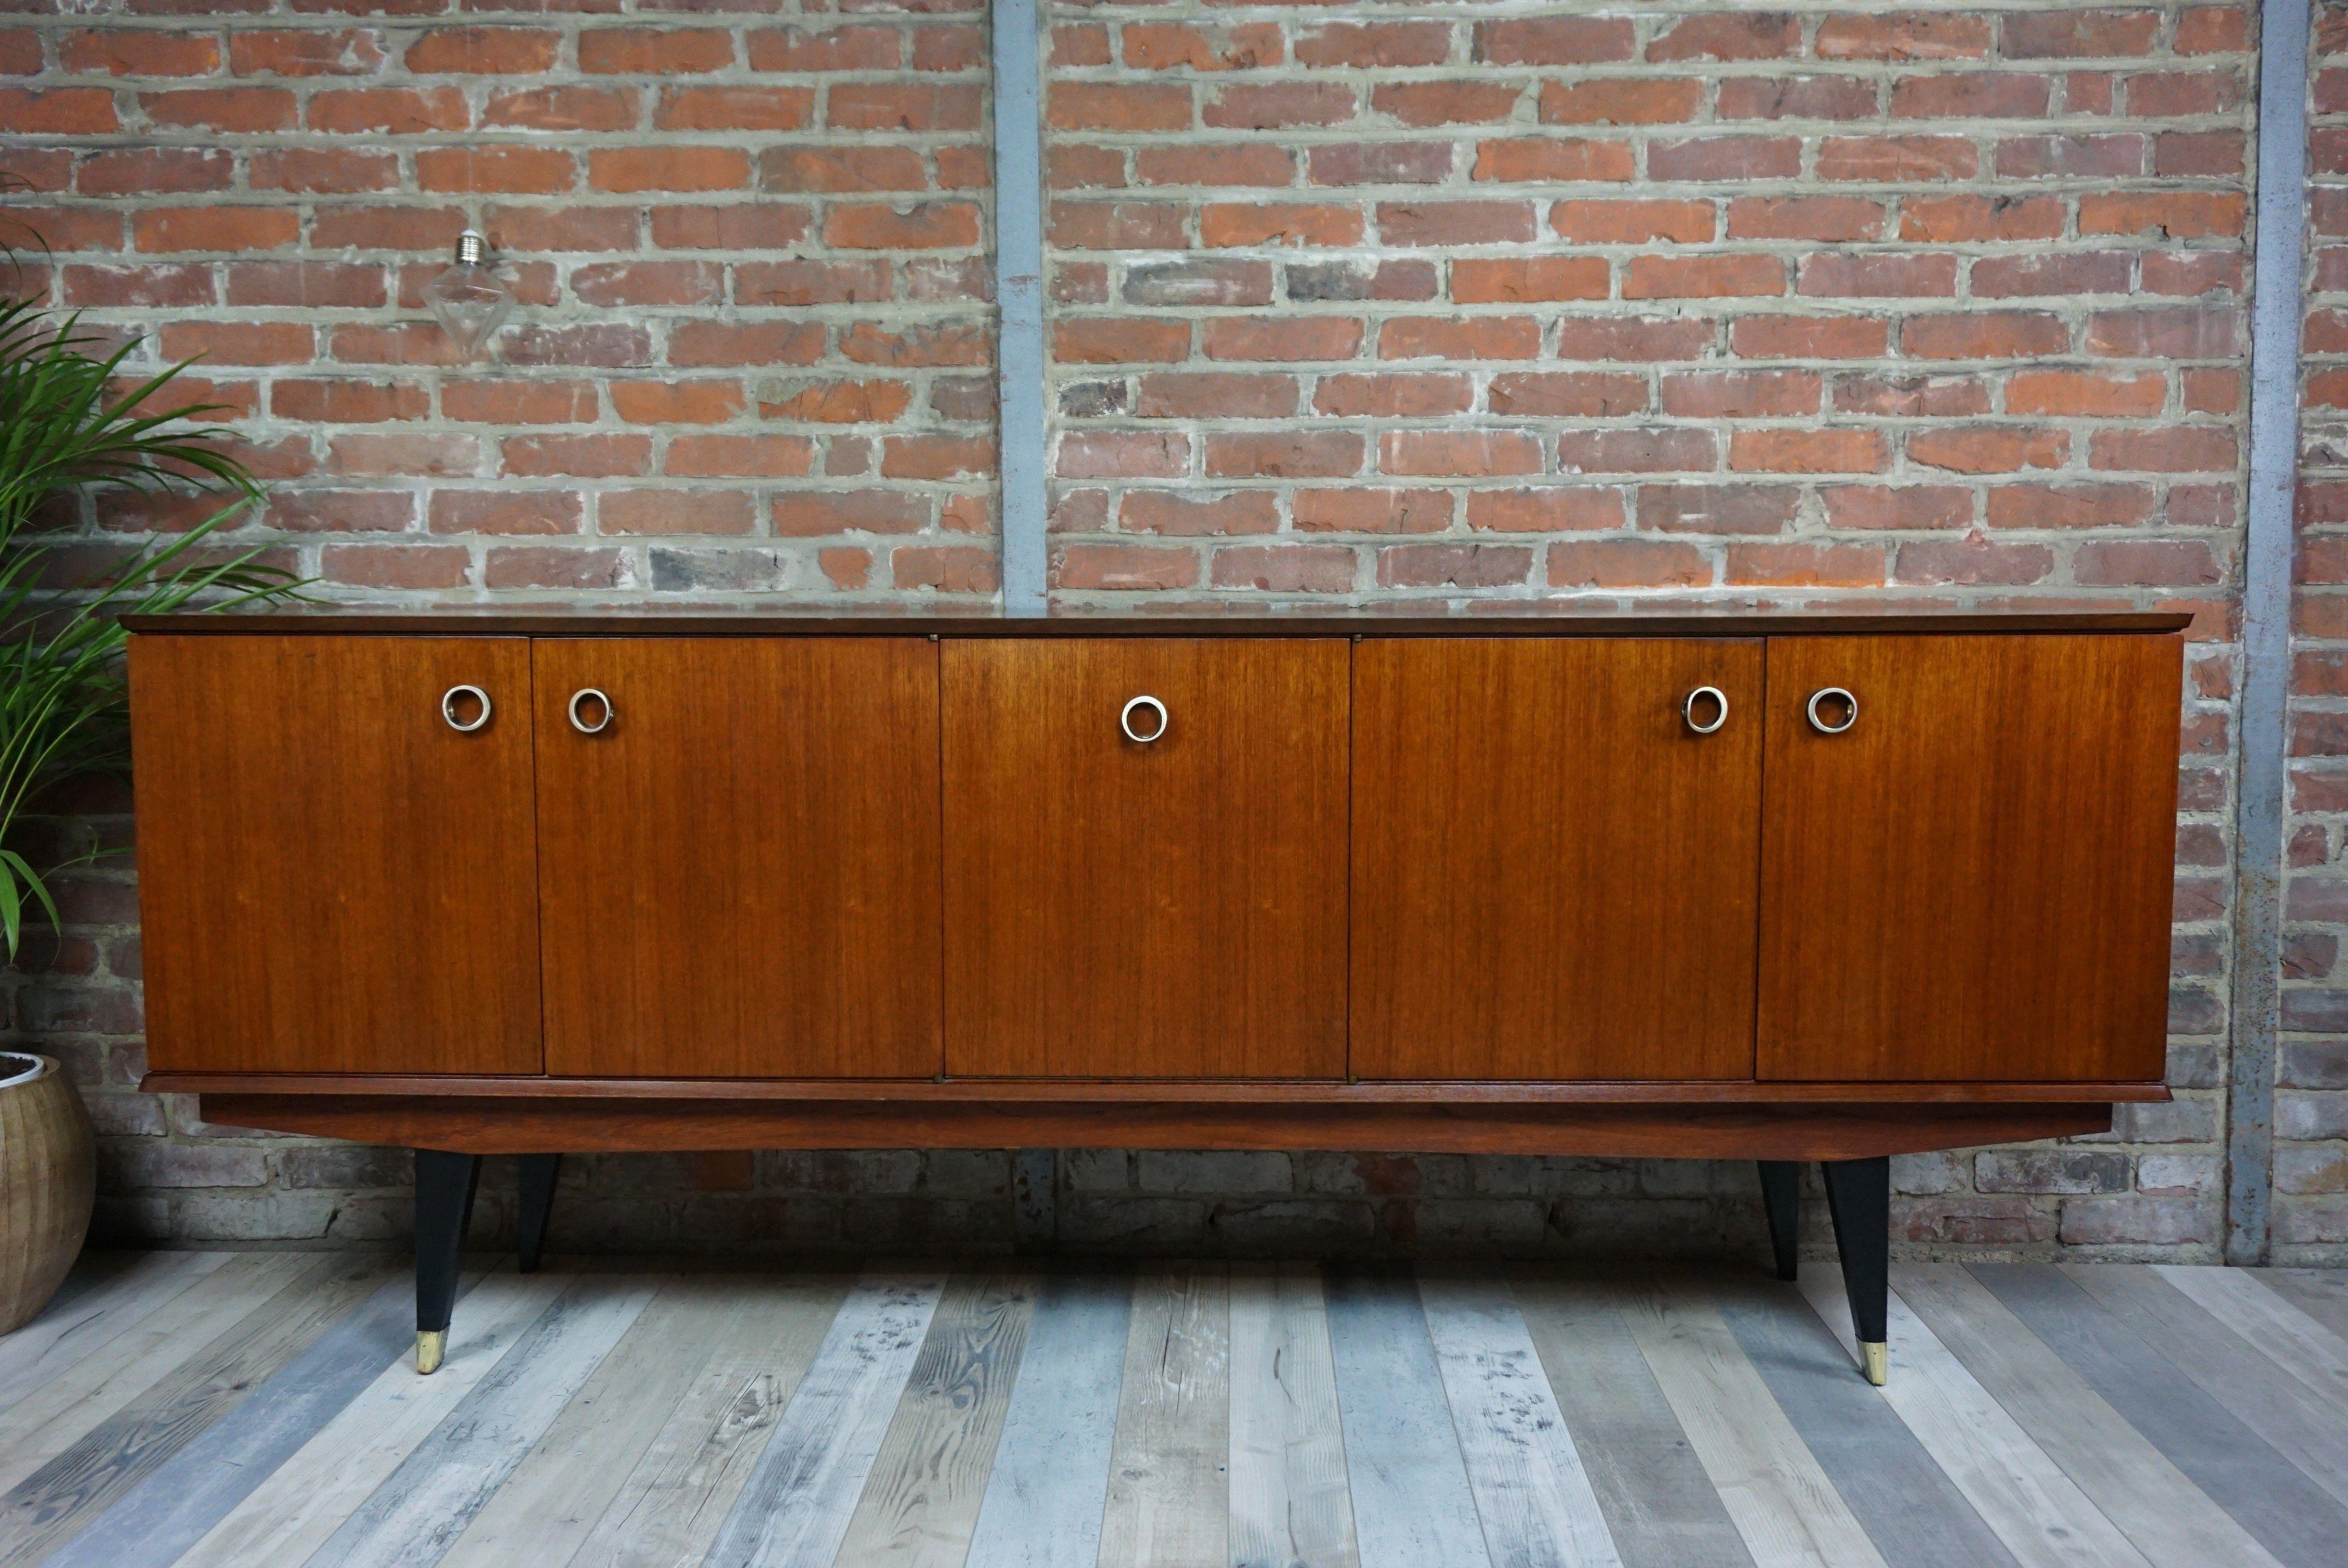 Enfilade En Teck Sideboard Annees 50 60 D Occasion Vintage Design Scandinave Industriel Ancien Vendu Sur Collector Chic Depo Furniture Home Decor Decor